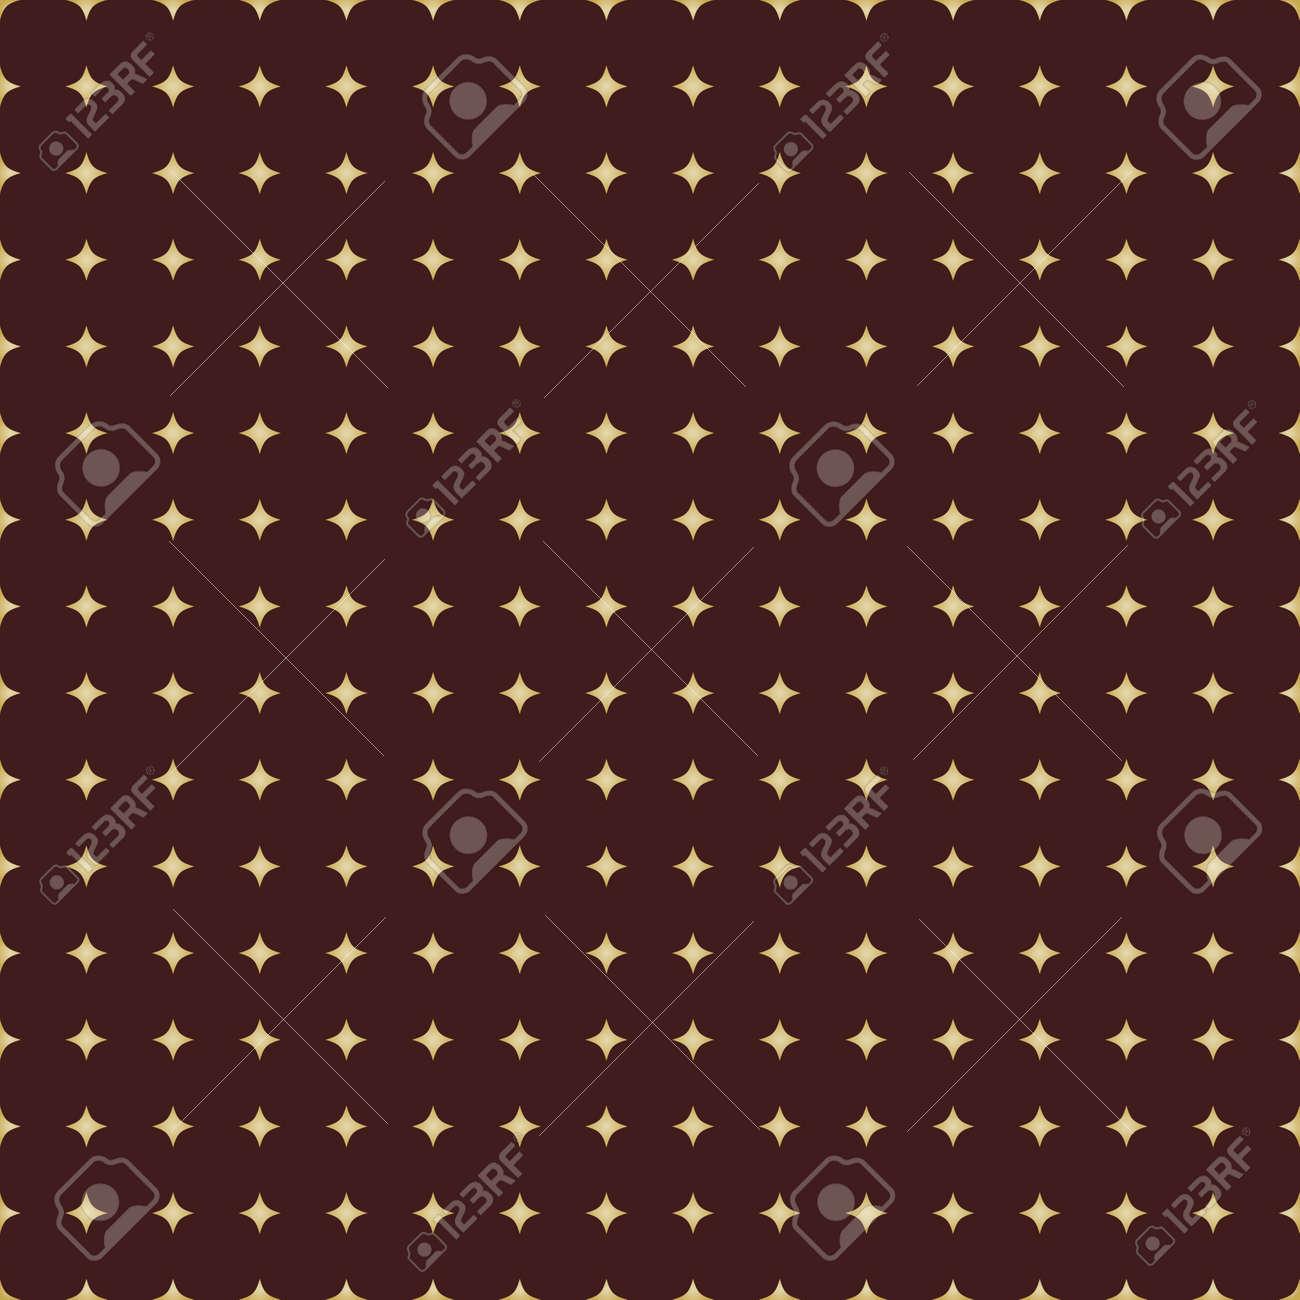 Seamless Modern Pattern With Golden Stars - 167039482